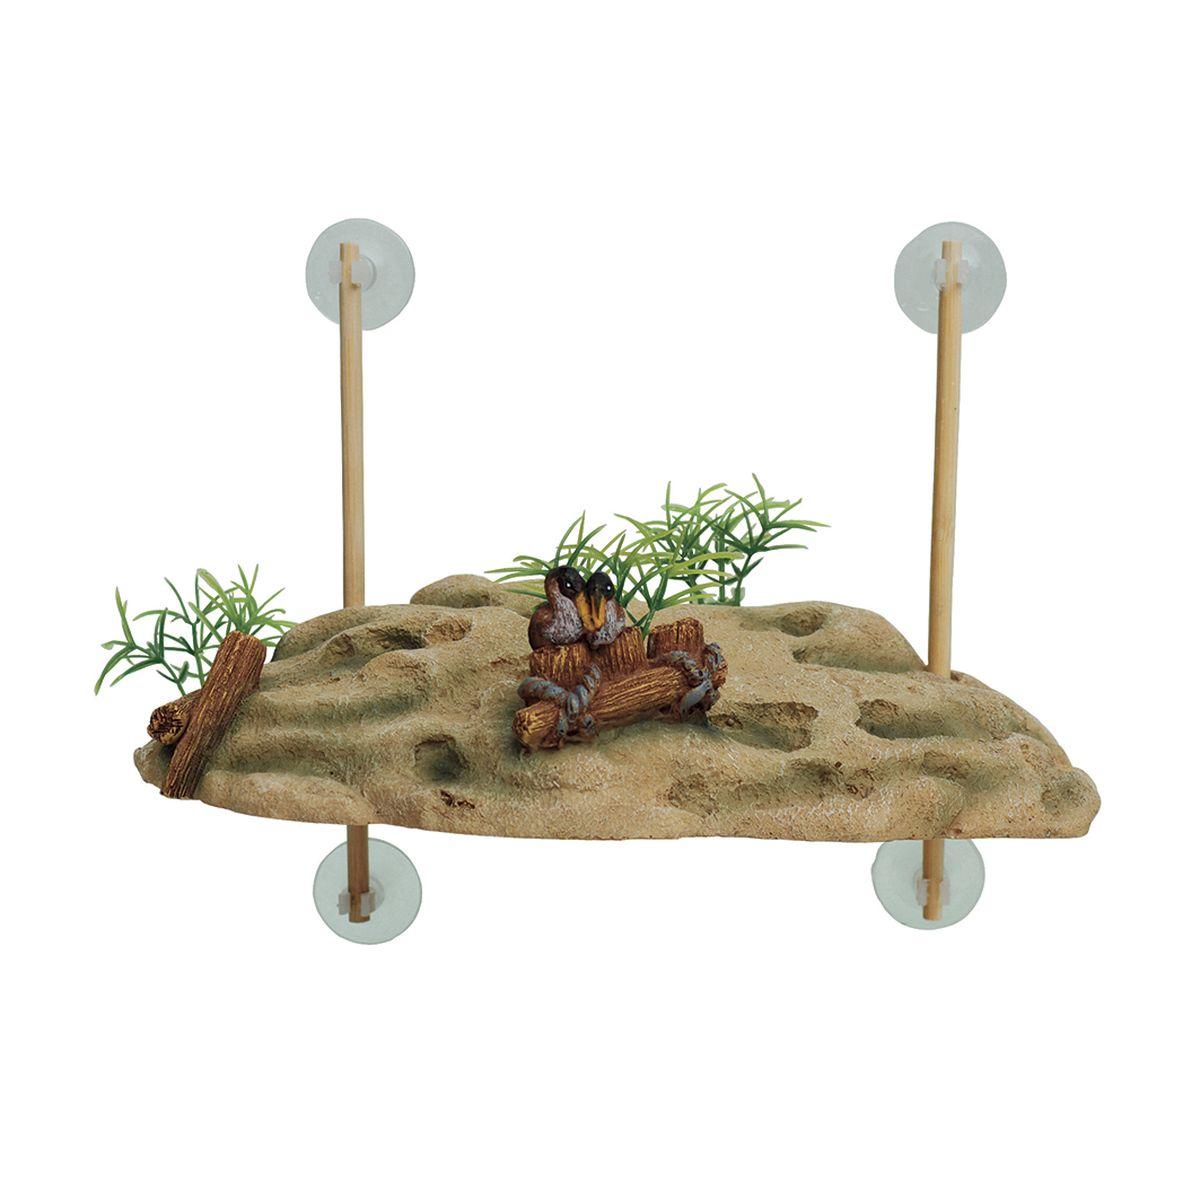 Декорация для аквариума ArtUniq Островок для черепах, на присосках, 24,5 x 11,5 x 7,5 смART-2261720Декорация для аквариума ArtUniq Островок для черепах, на присосках, 24,5 x 11,5 x 7,5 см